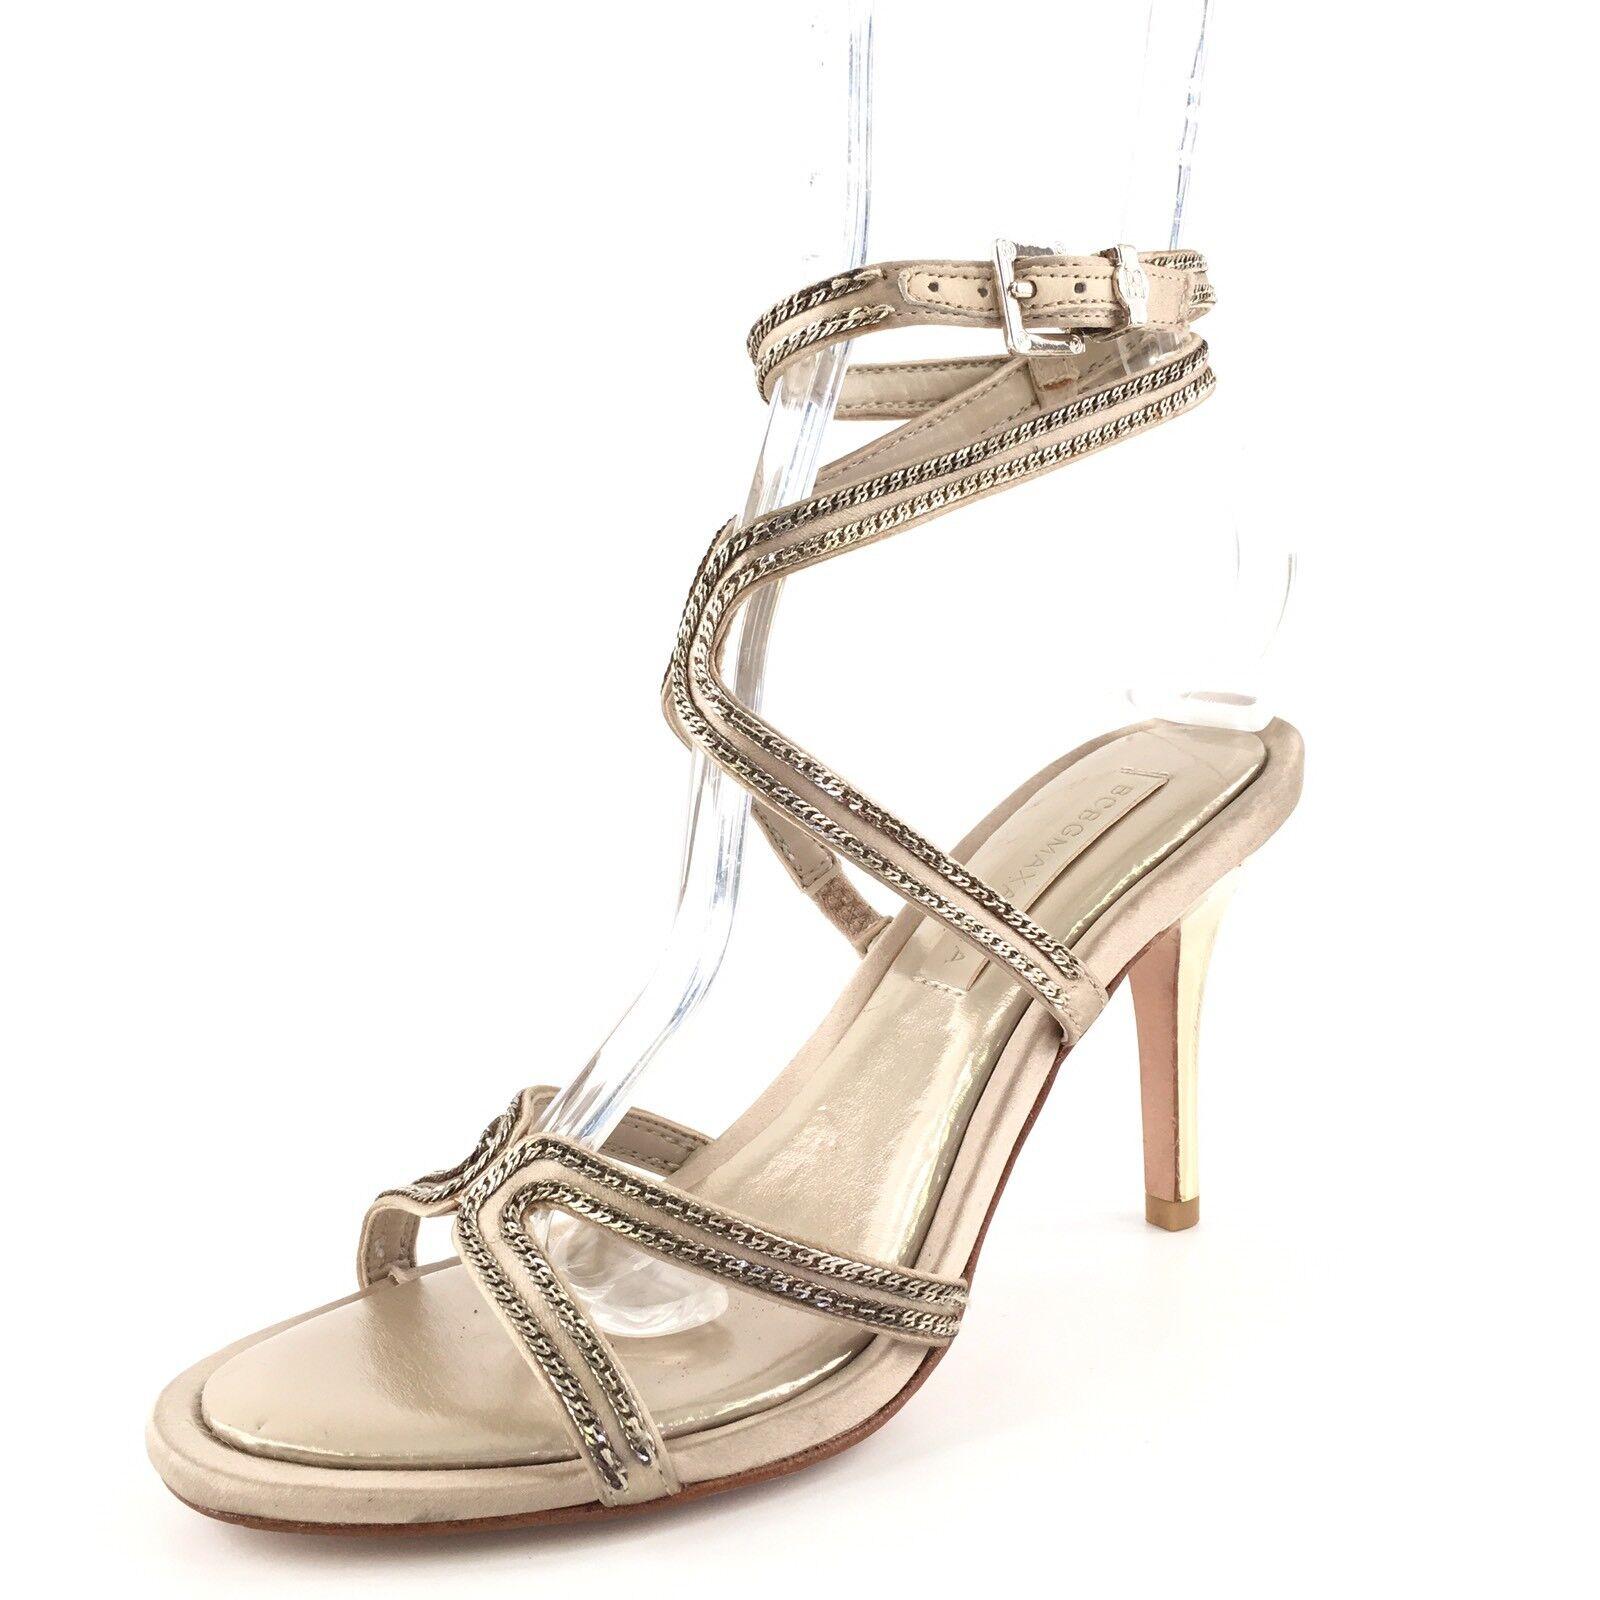 BCBG Max Azria Primp Champagne Satin Ankle Strap Sandals Women's Size 6 M